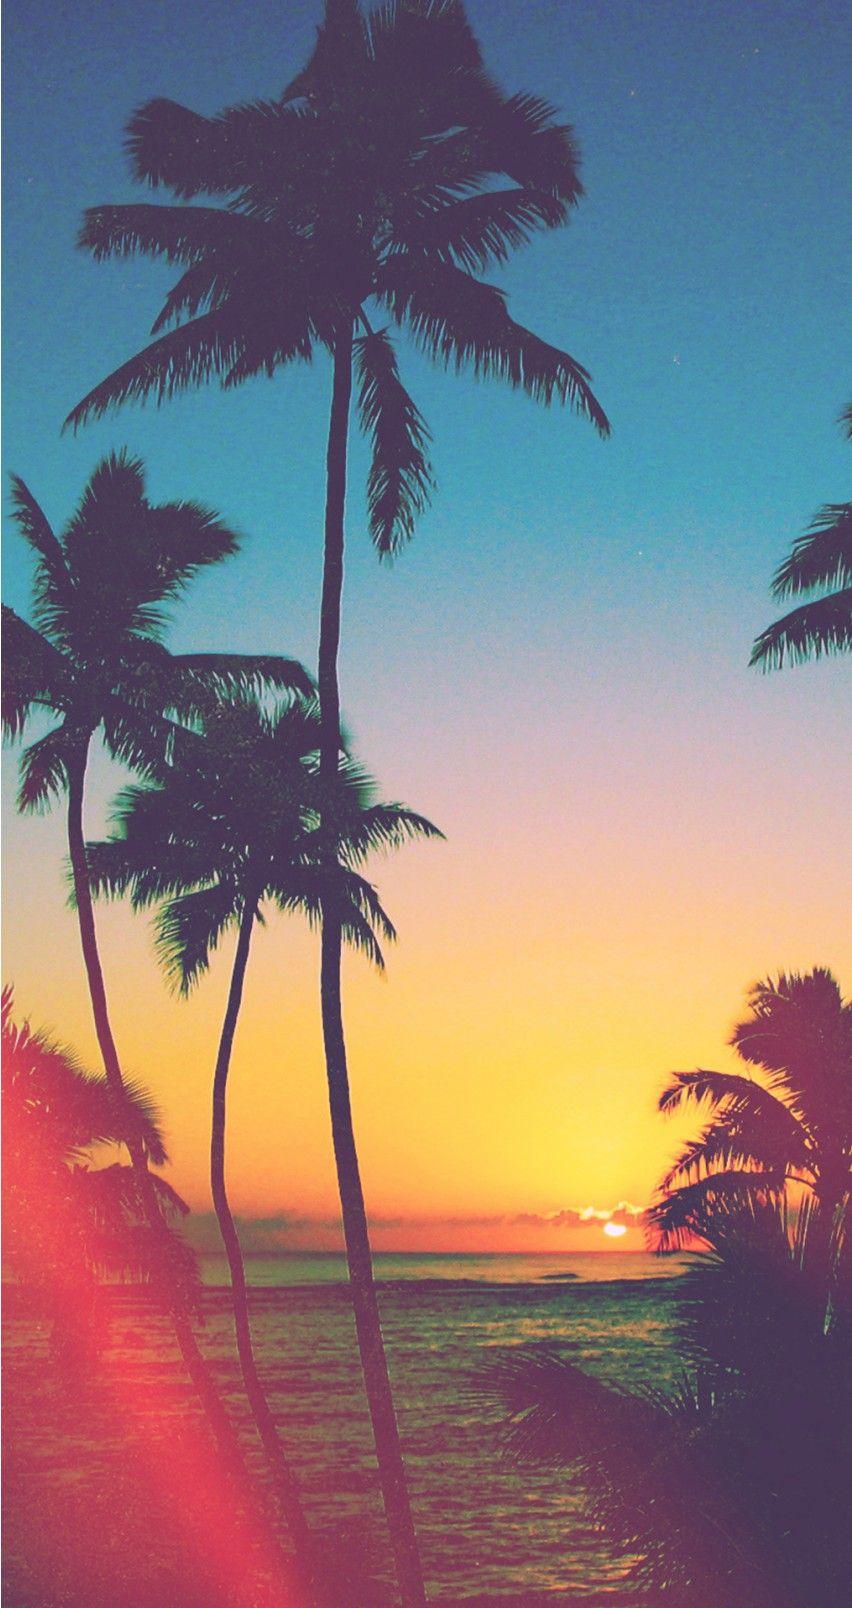 Wallpaper iphone tropical - Tropical Beach Tap To See Wonderful Beach Sea Ocean Wallpaper For Iphone 7